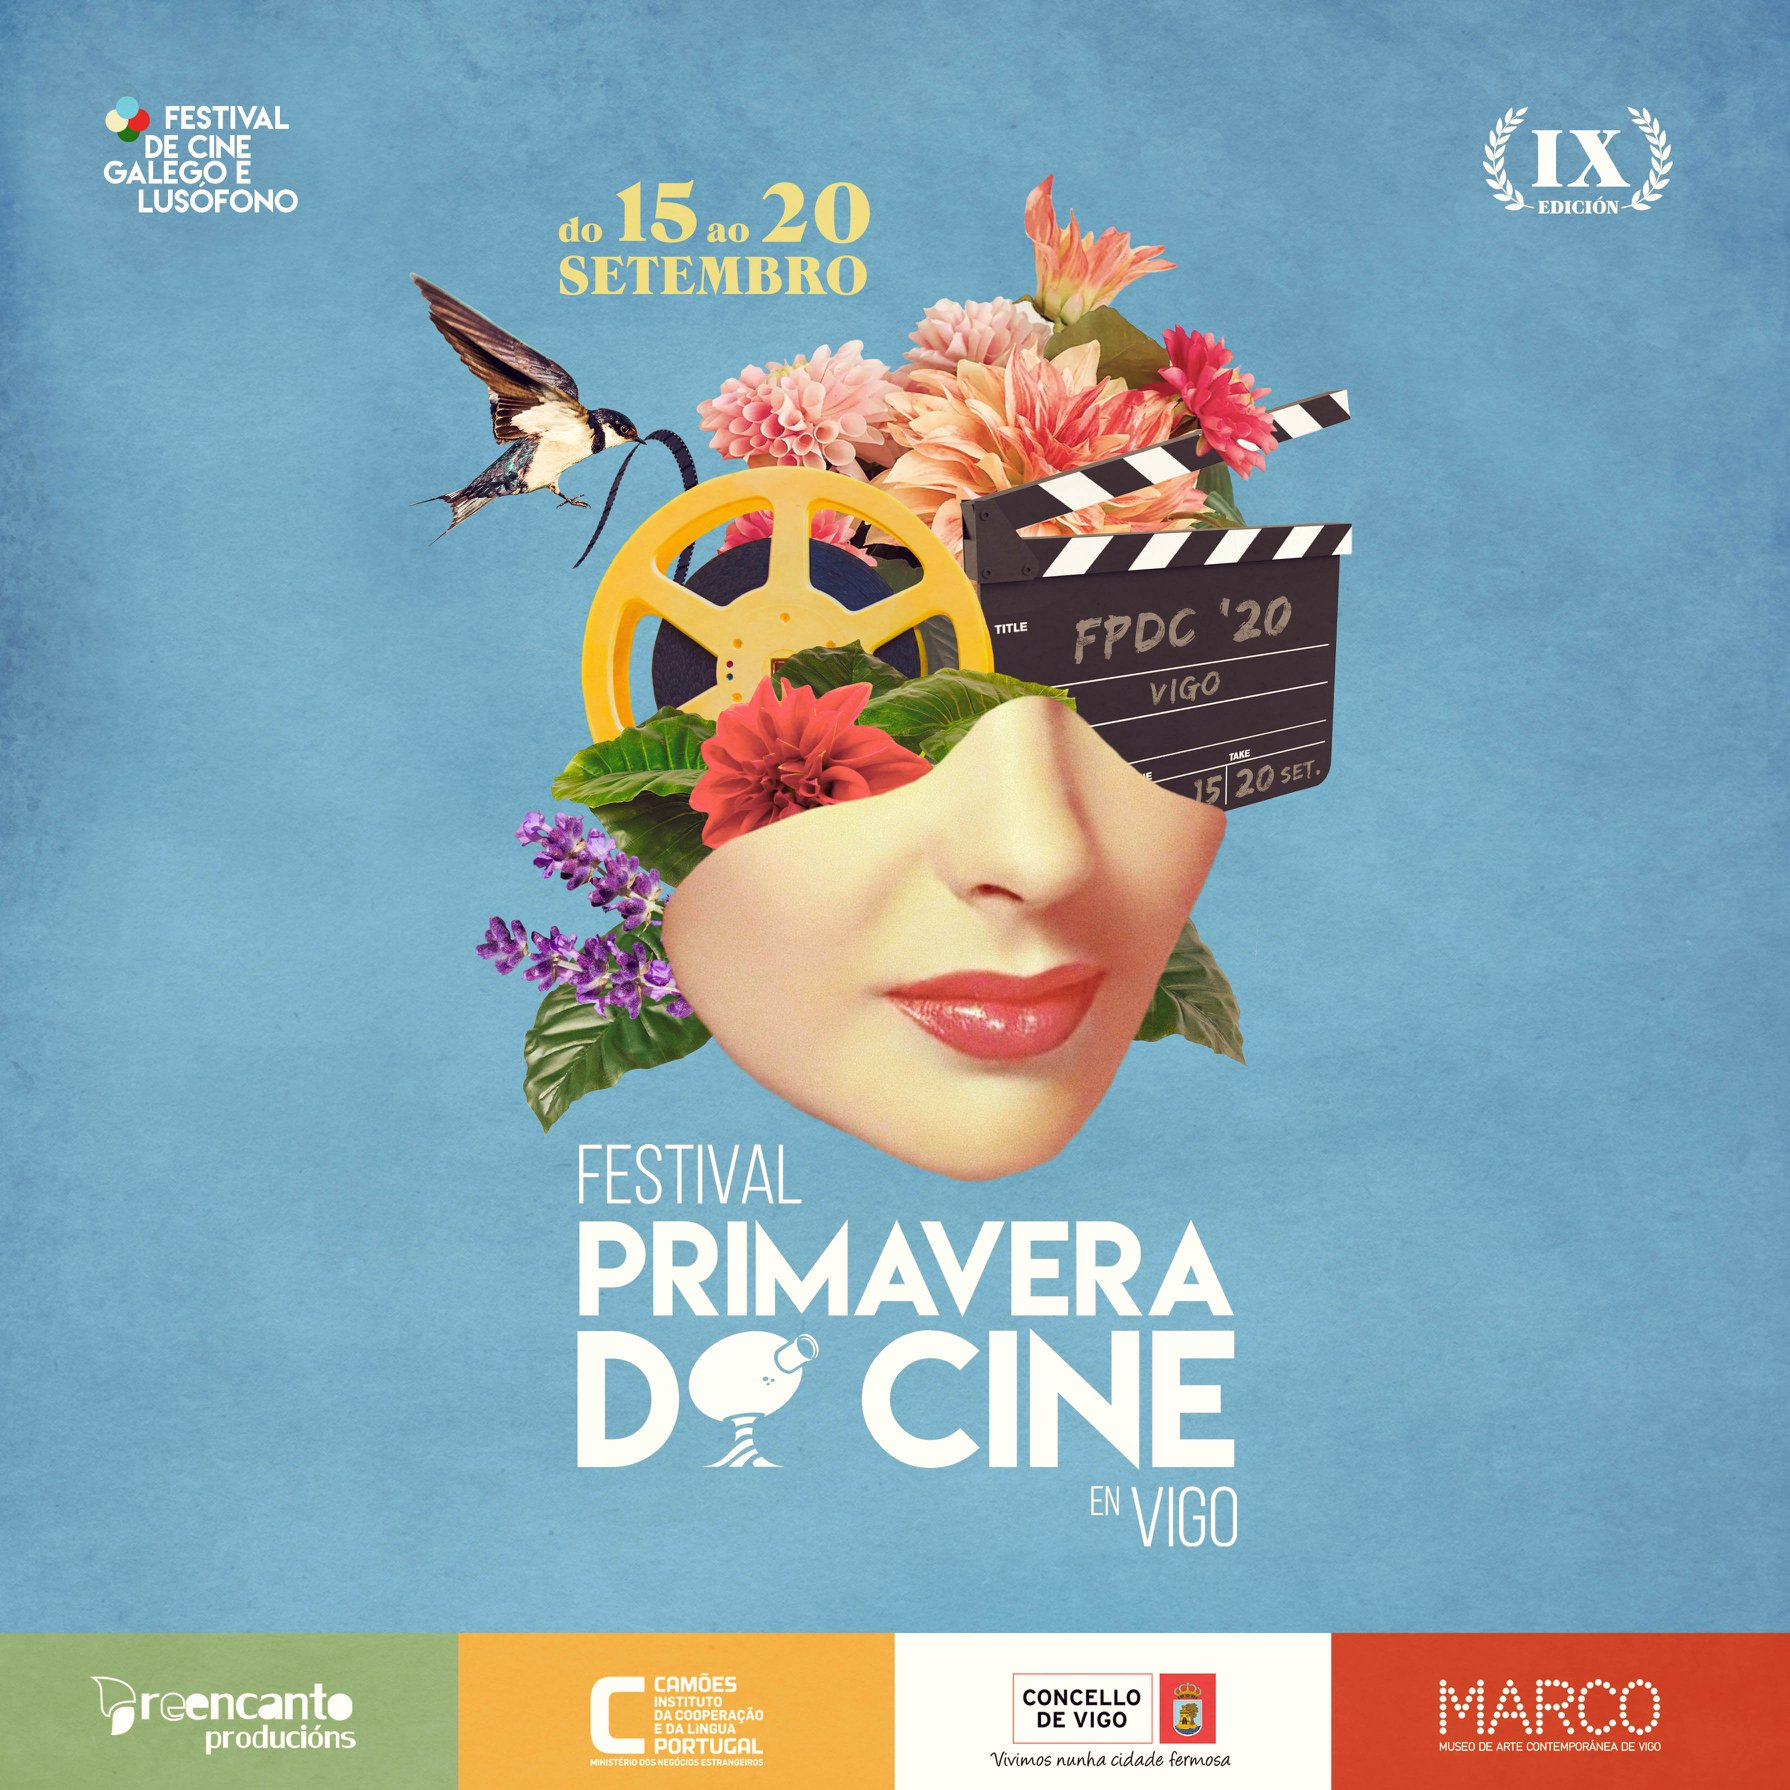 O festival audiovisual galego lusófono desenvólvese entre o 15 e o 20 de setembro